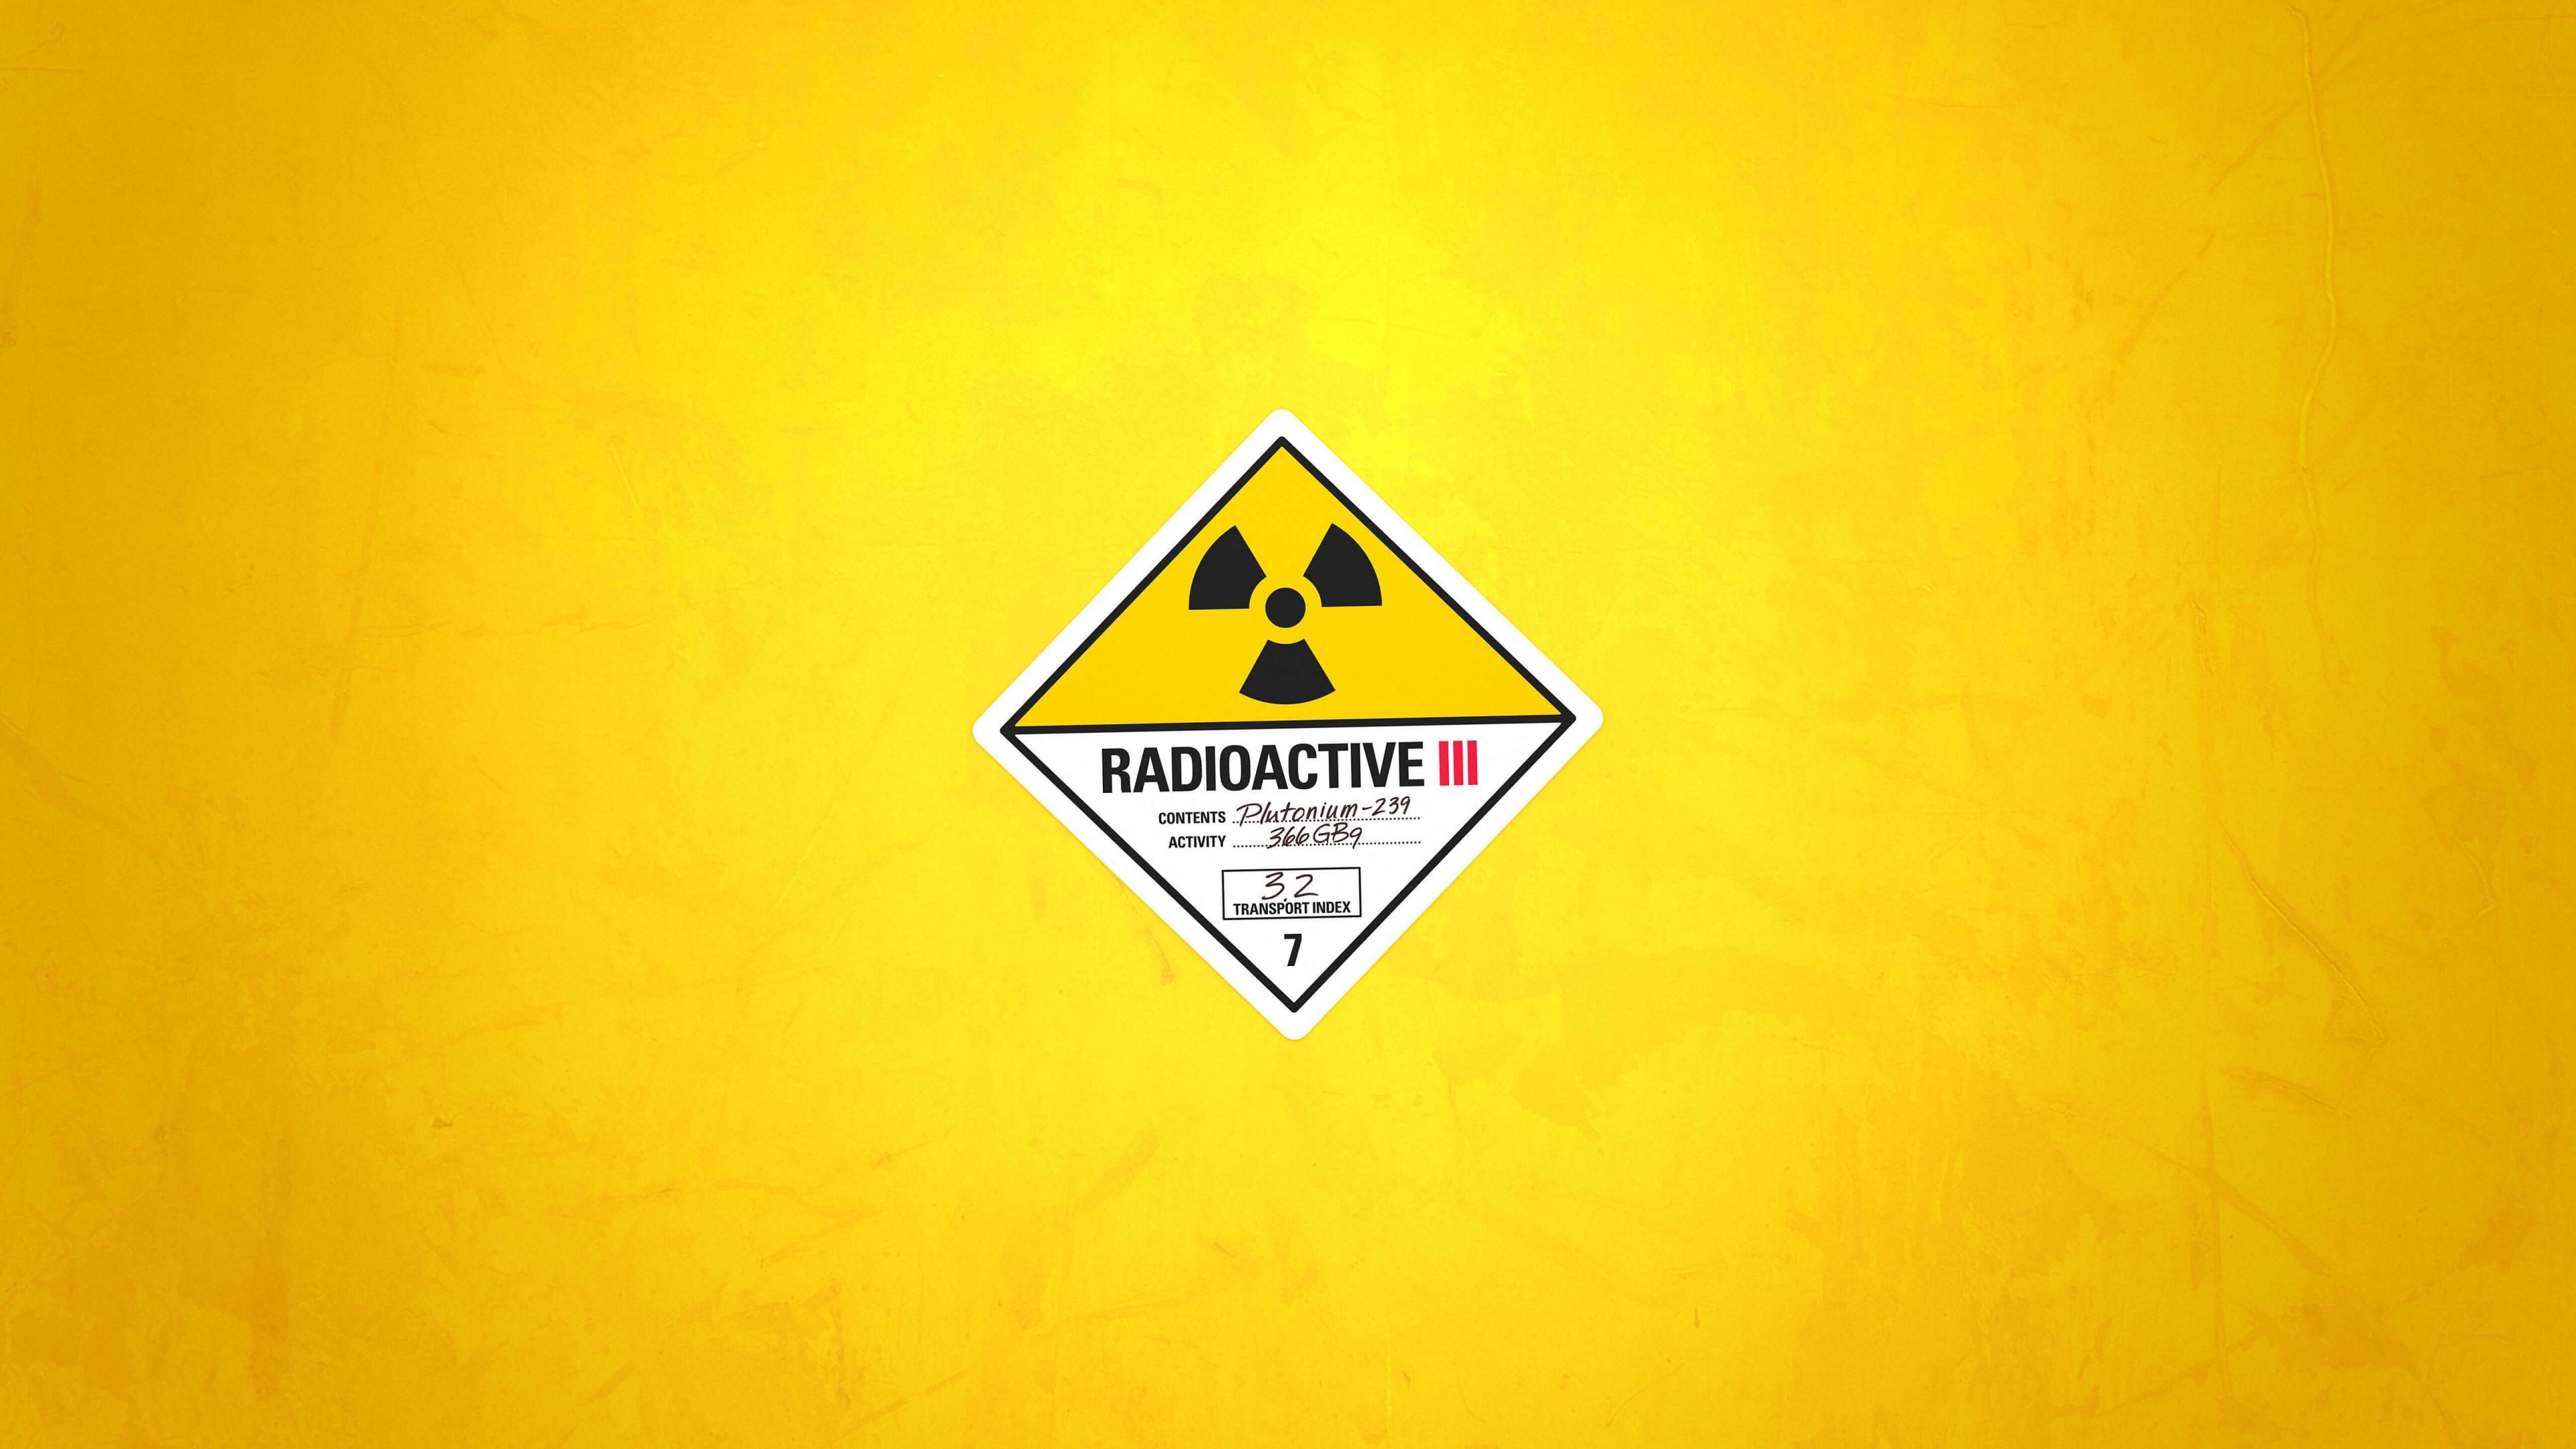 Res: 3840x2160, Radioactive Wallpapers 13 - 3840 X 2160